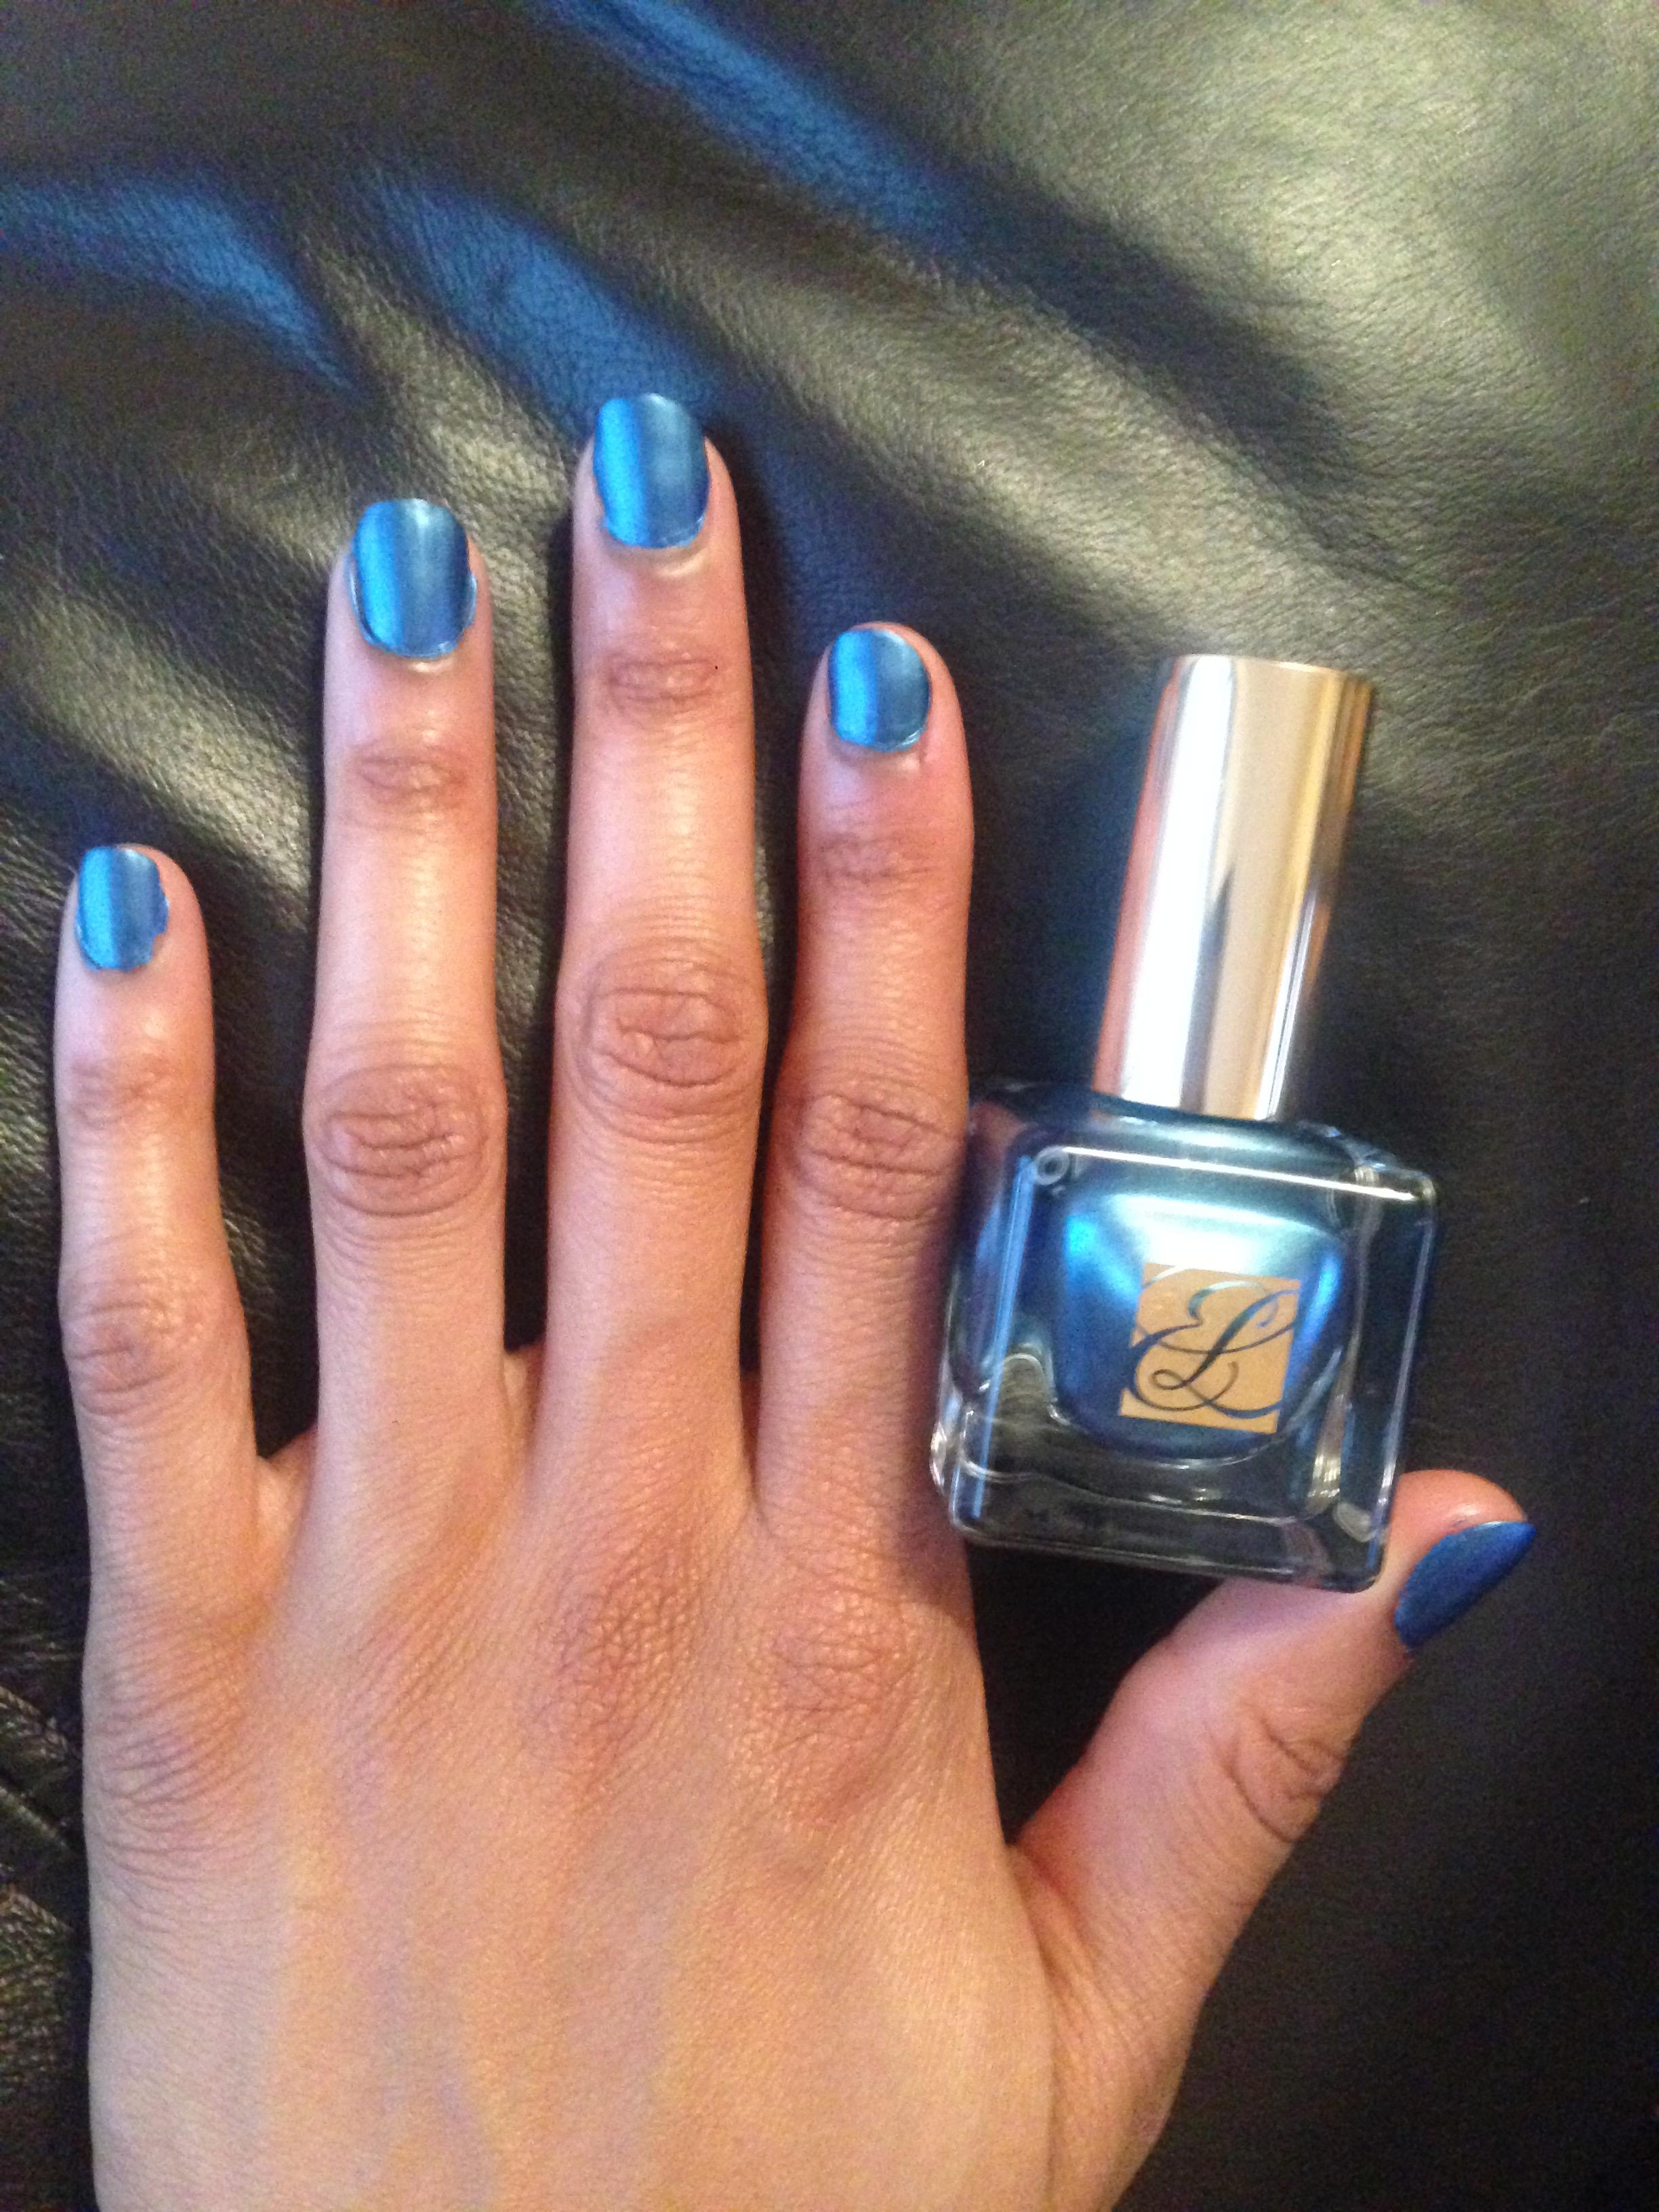 Nails: Estee Lauder Pure Color Nail Lacquer review – Nola Likes